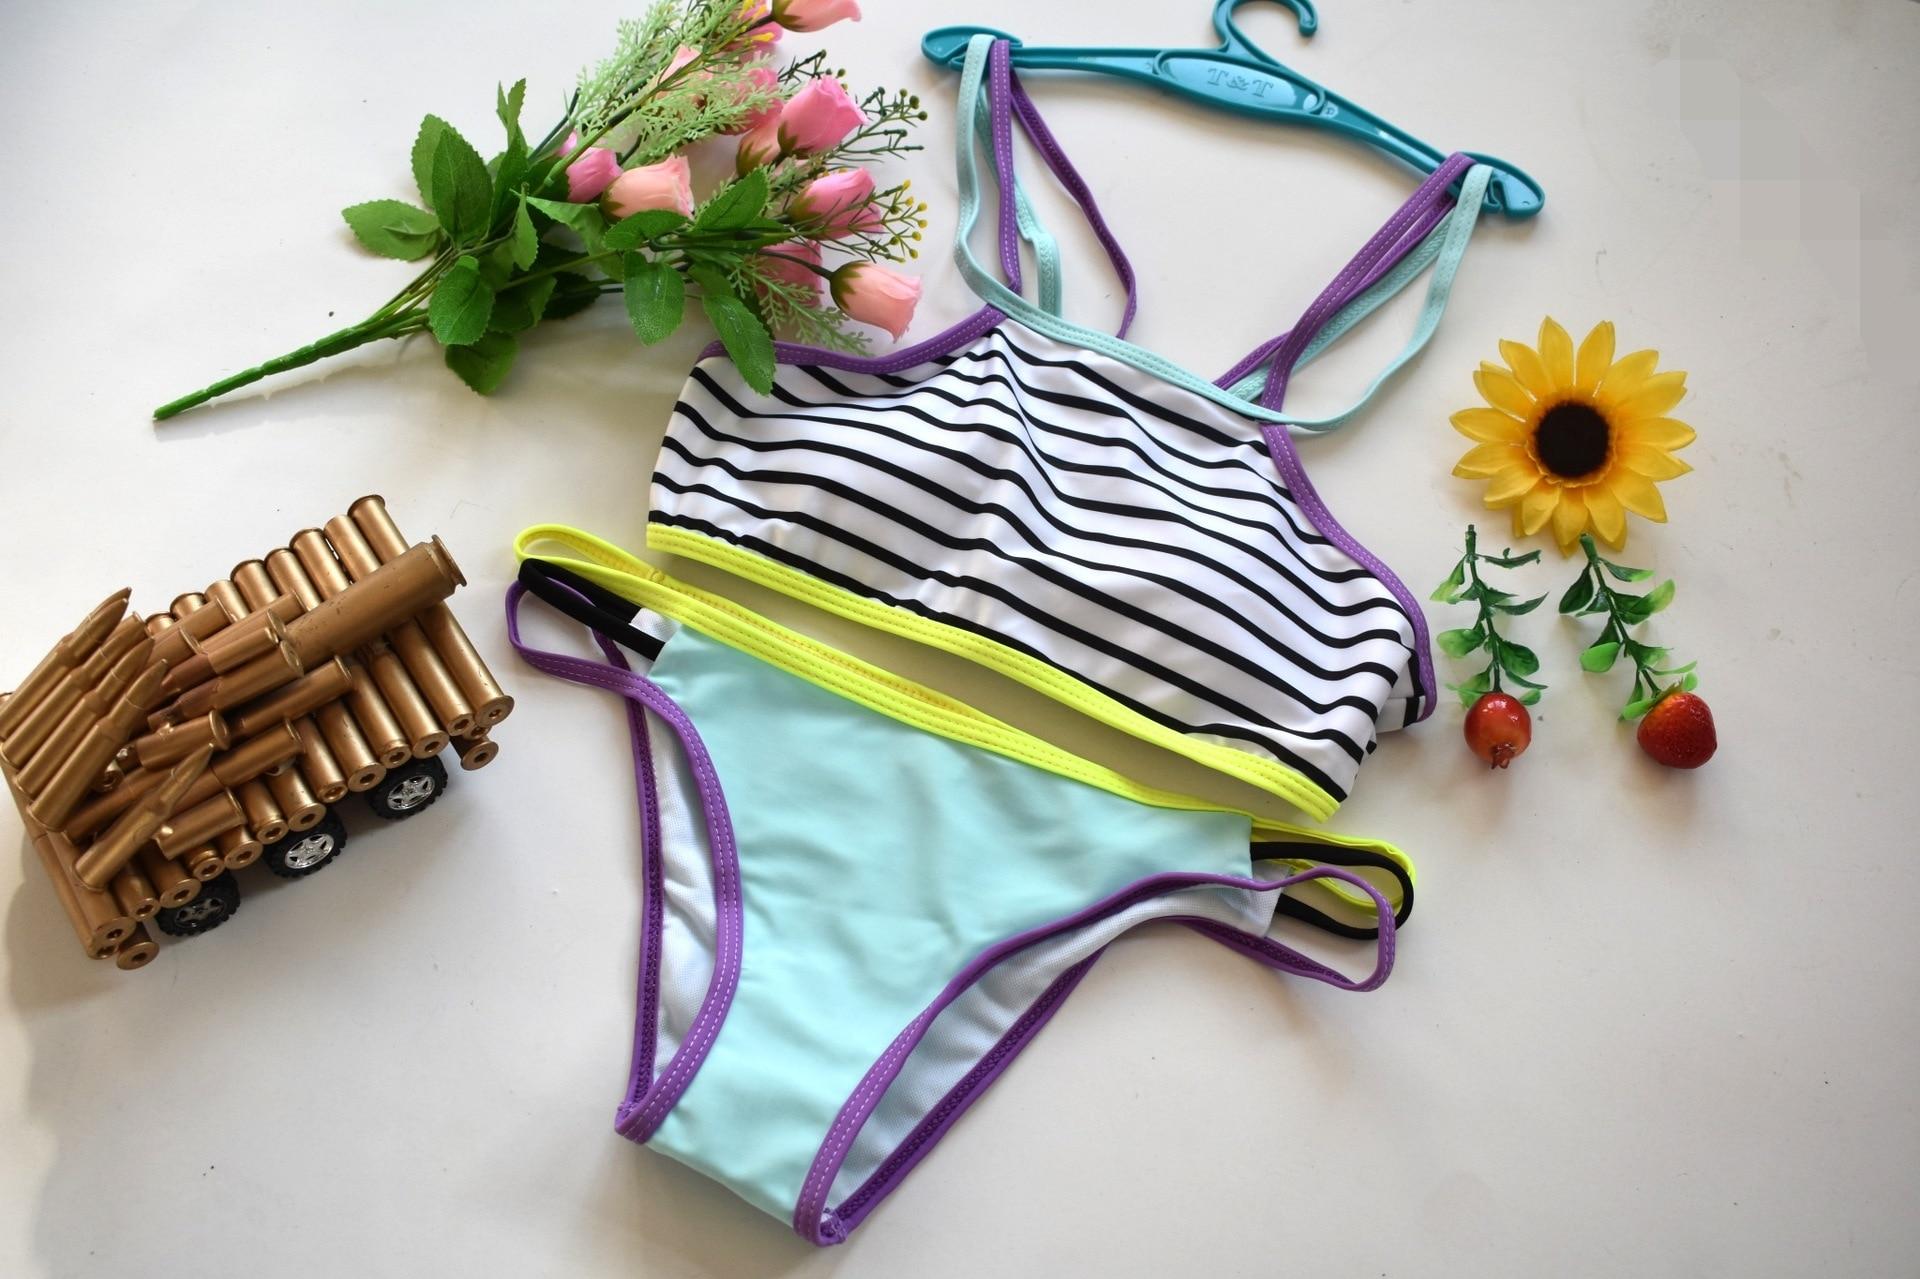 2017 New Stripped High Neck Patchwork Bikini Set Swimsuit Bathing Suit Swimwear Beachwear